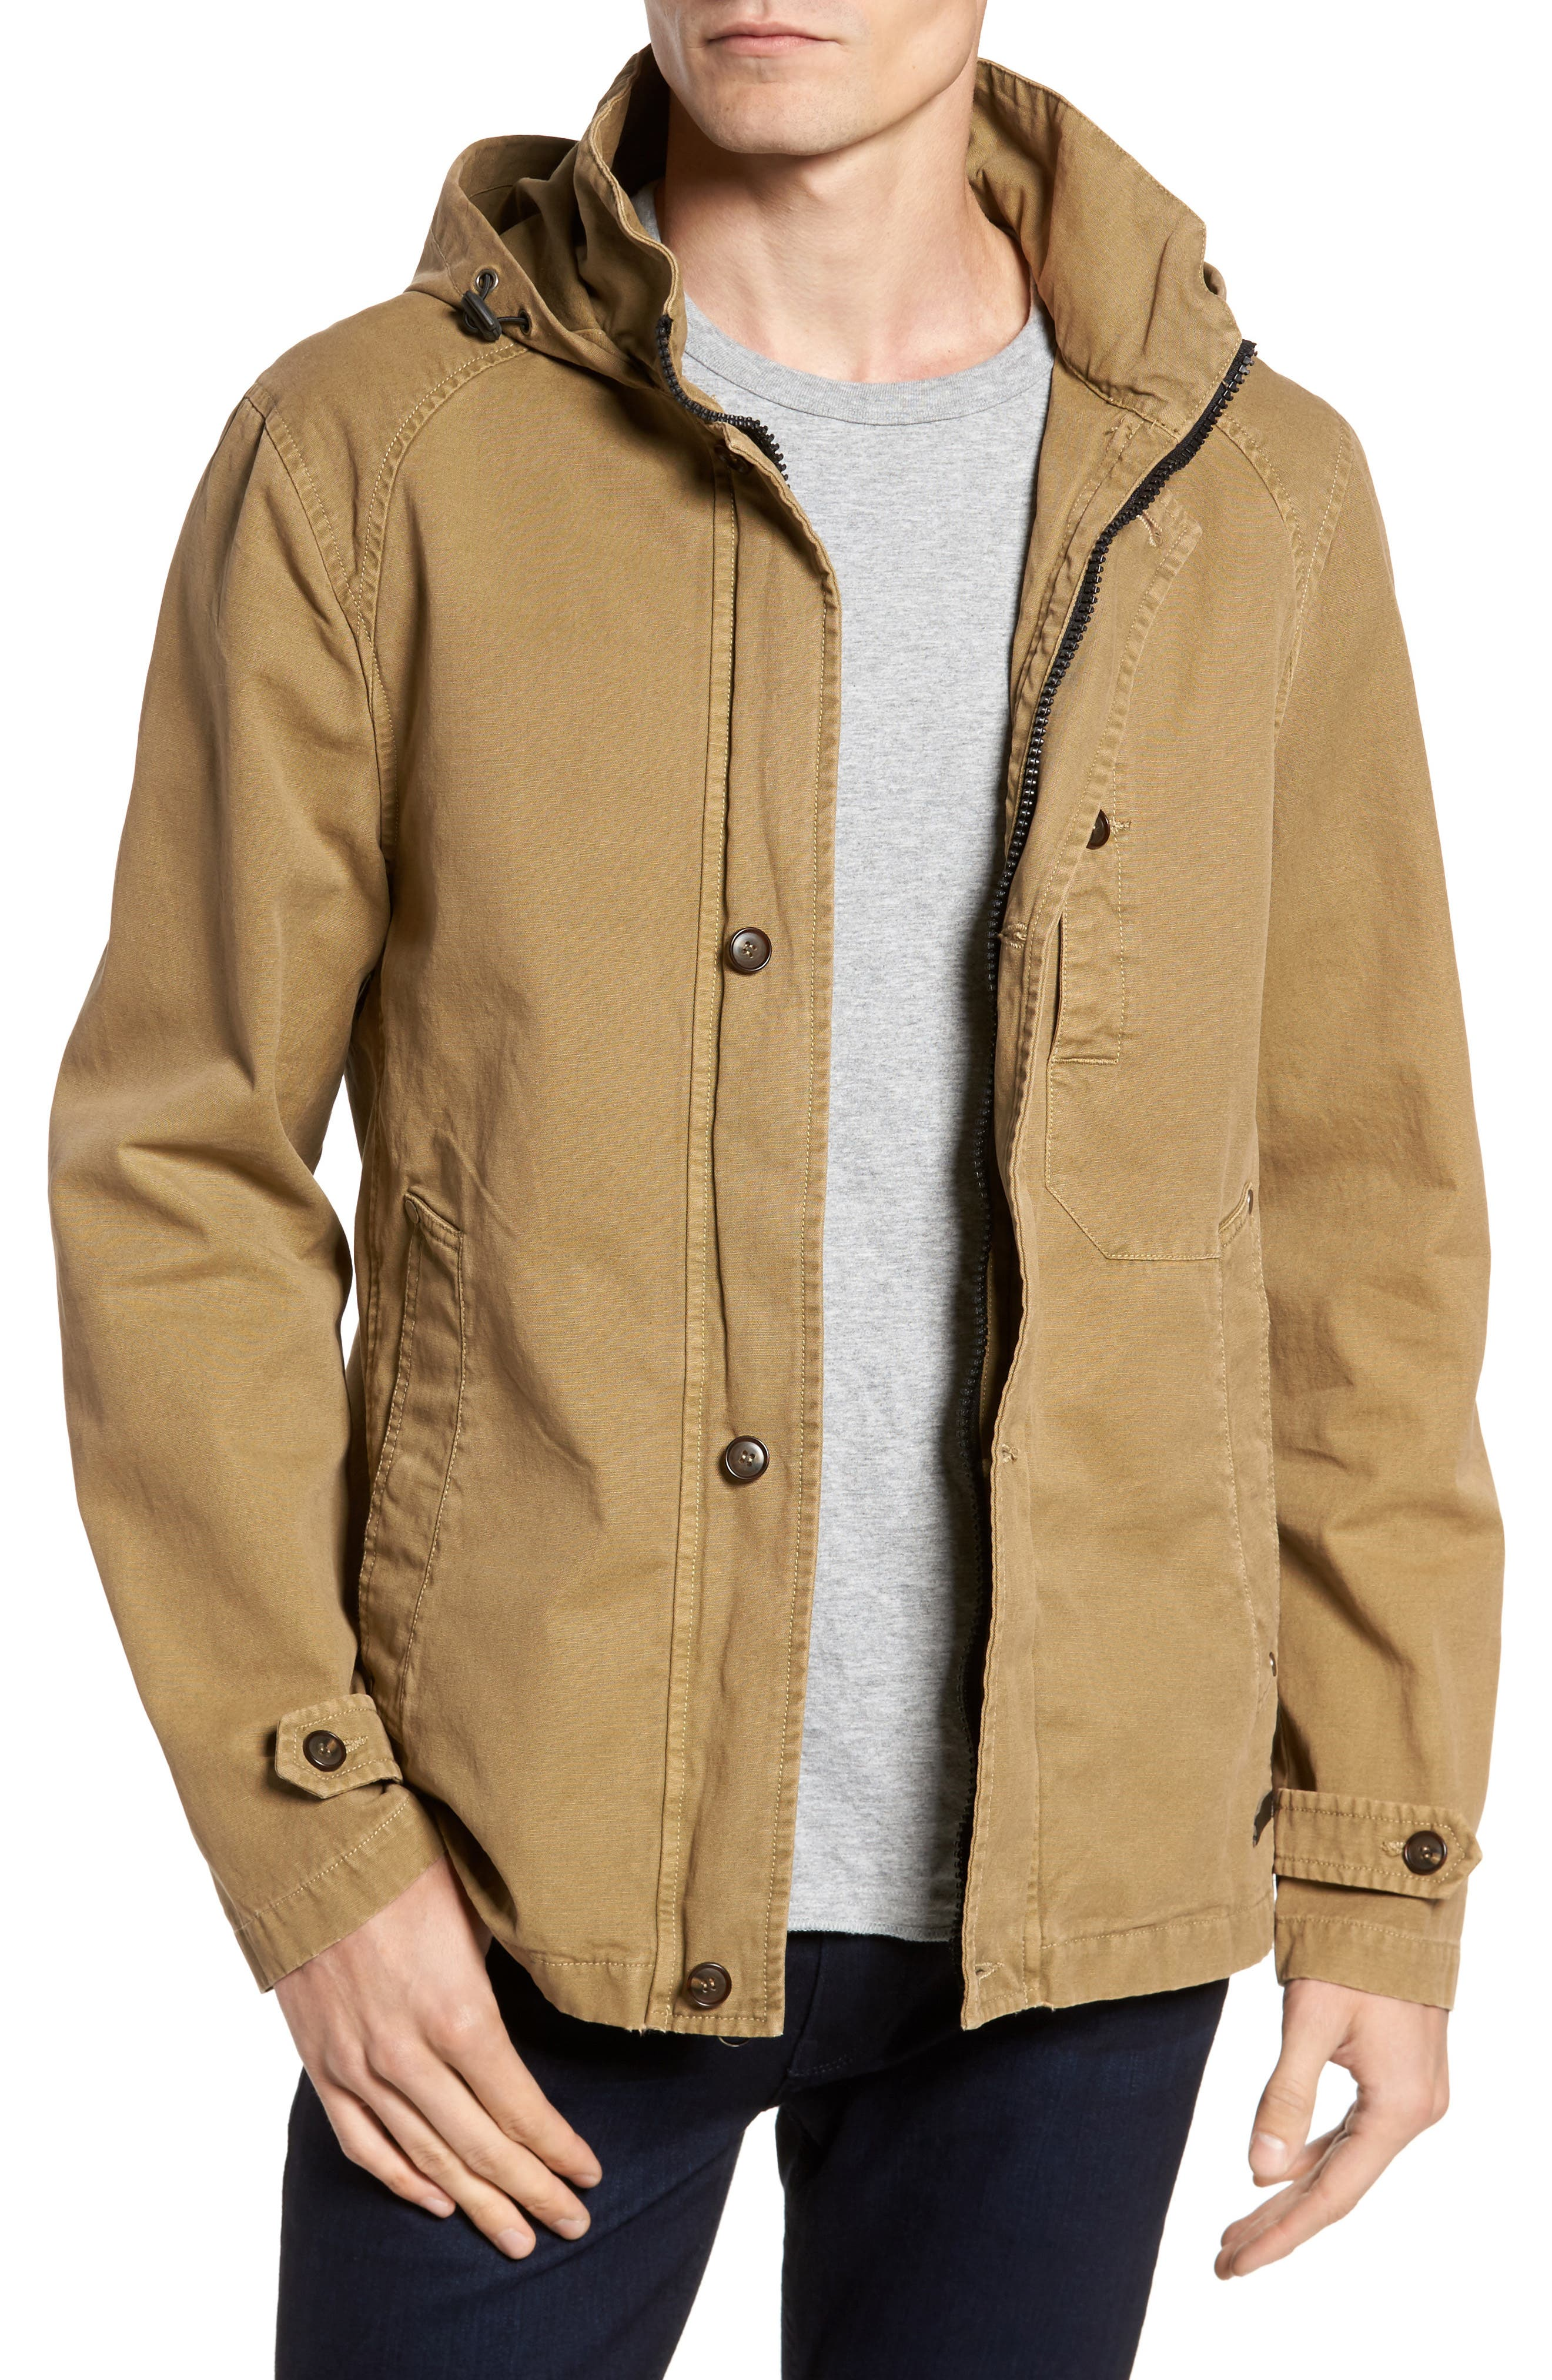 Herman Twill Hooded Jacket,                             Main thumbnail 1, color,                             250